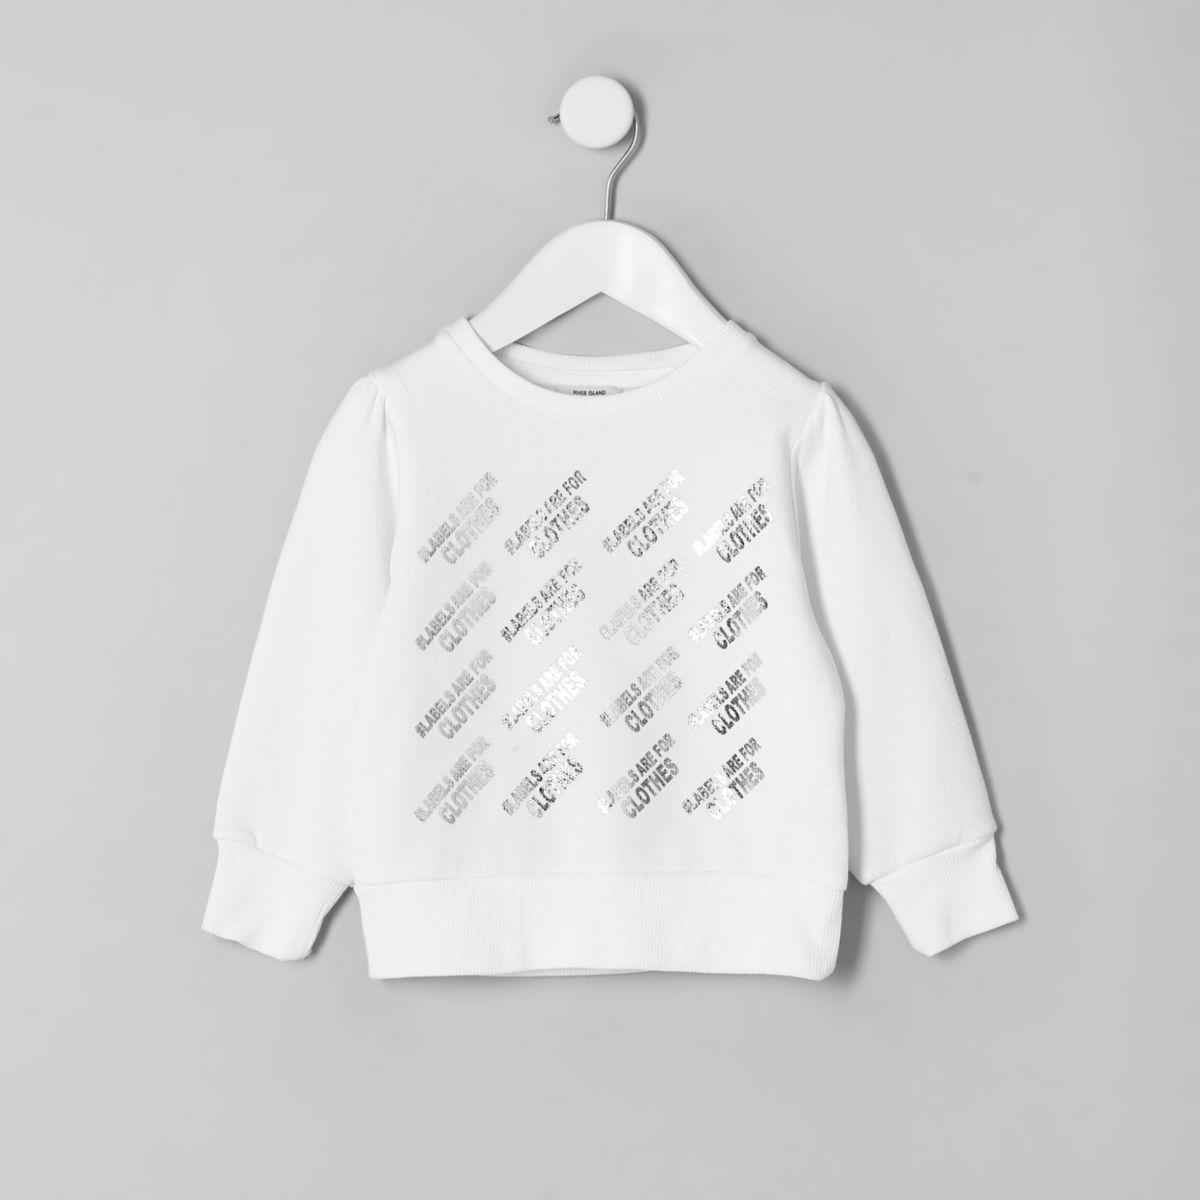 Mini kids Ditch the Label charity sweatshirt